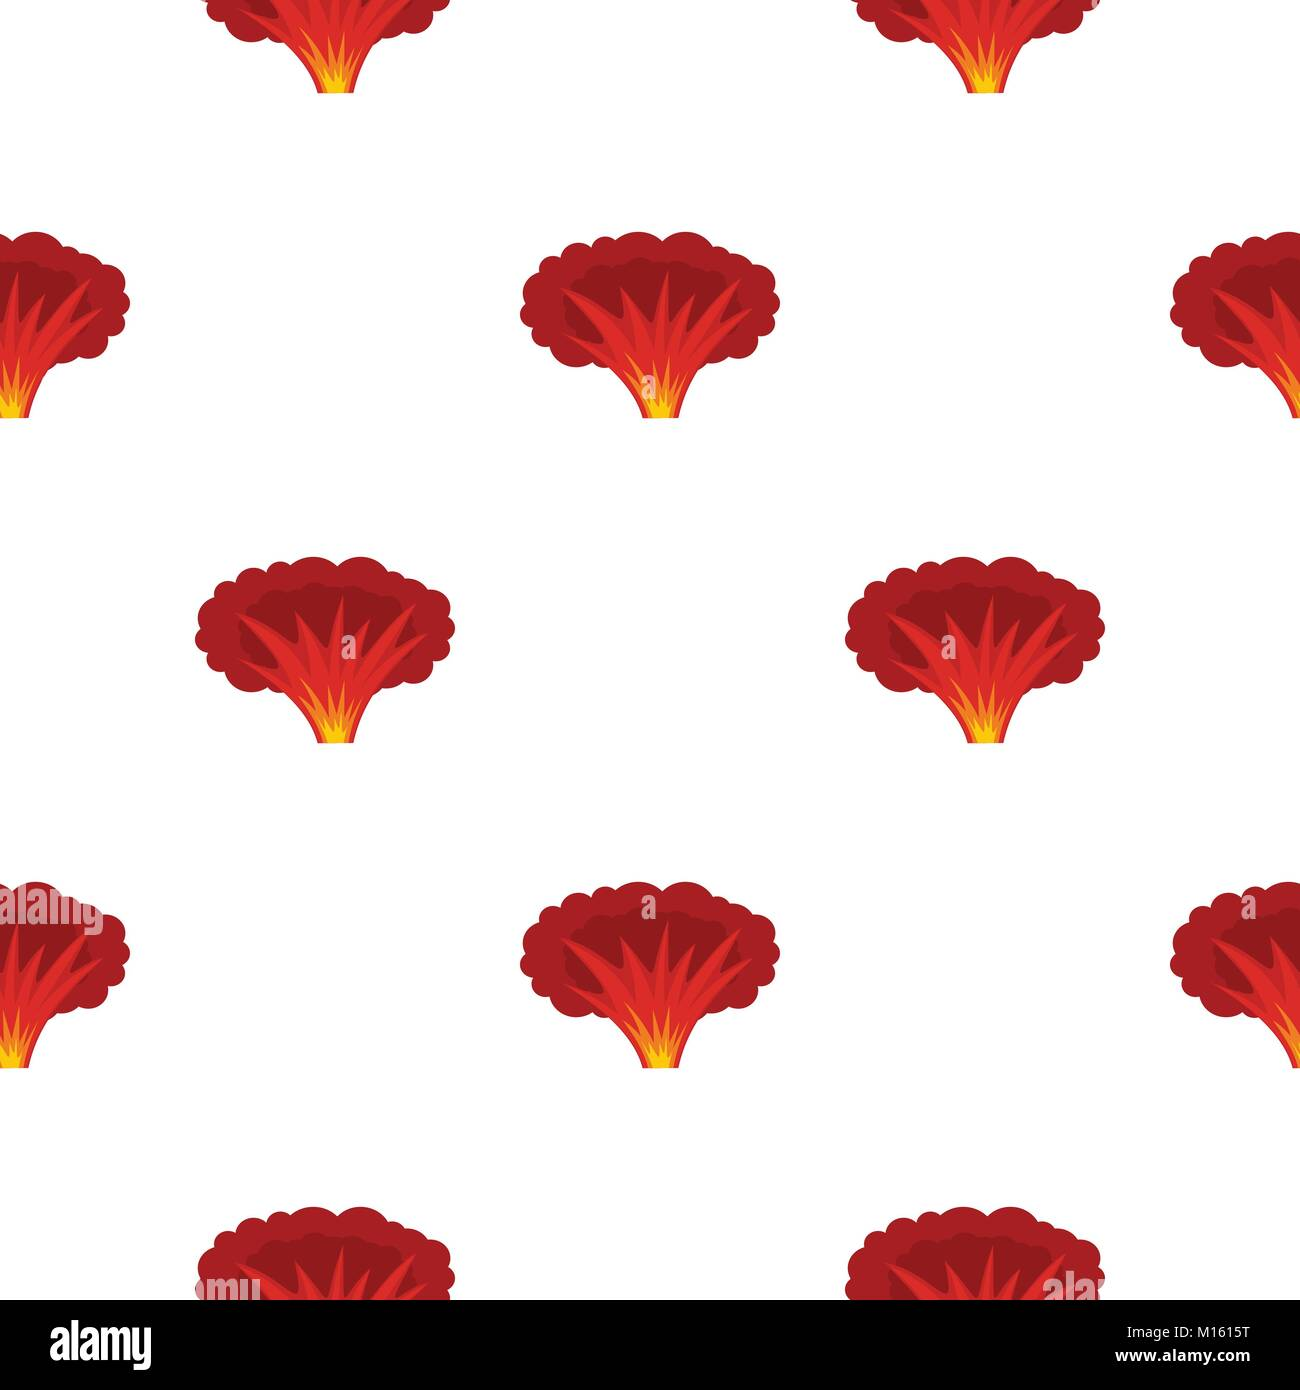 Atomical explosion pattern seamless - Stock Image